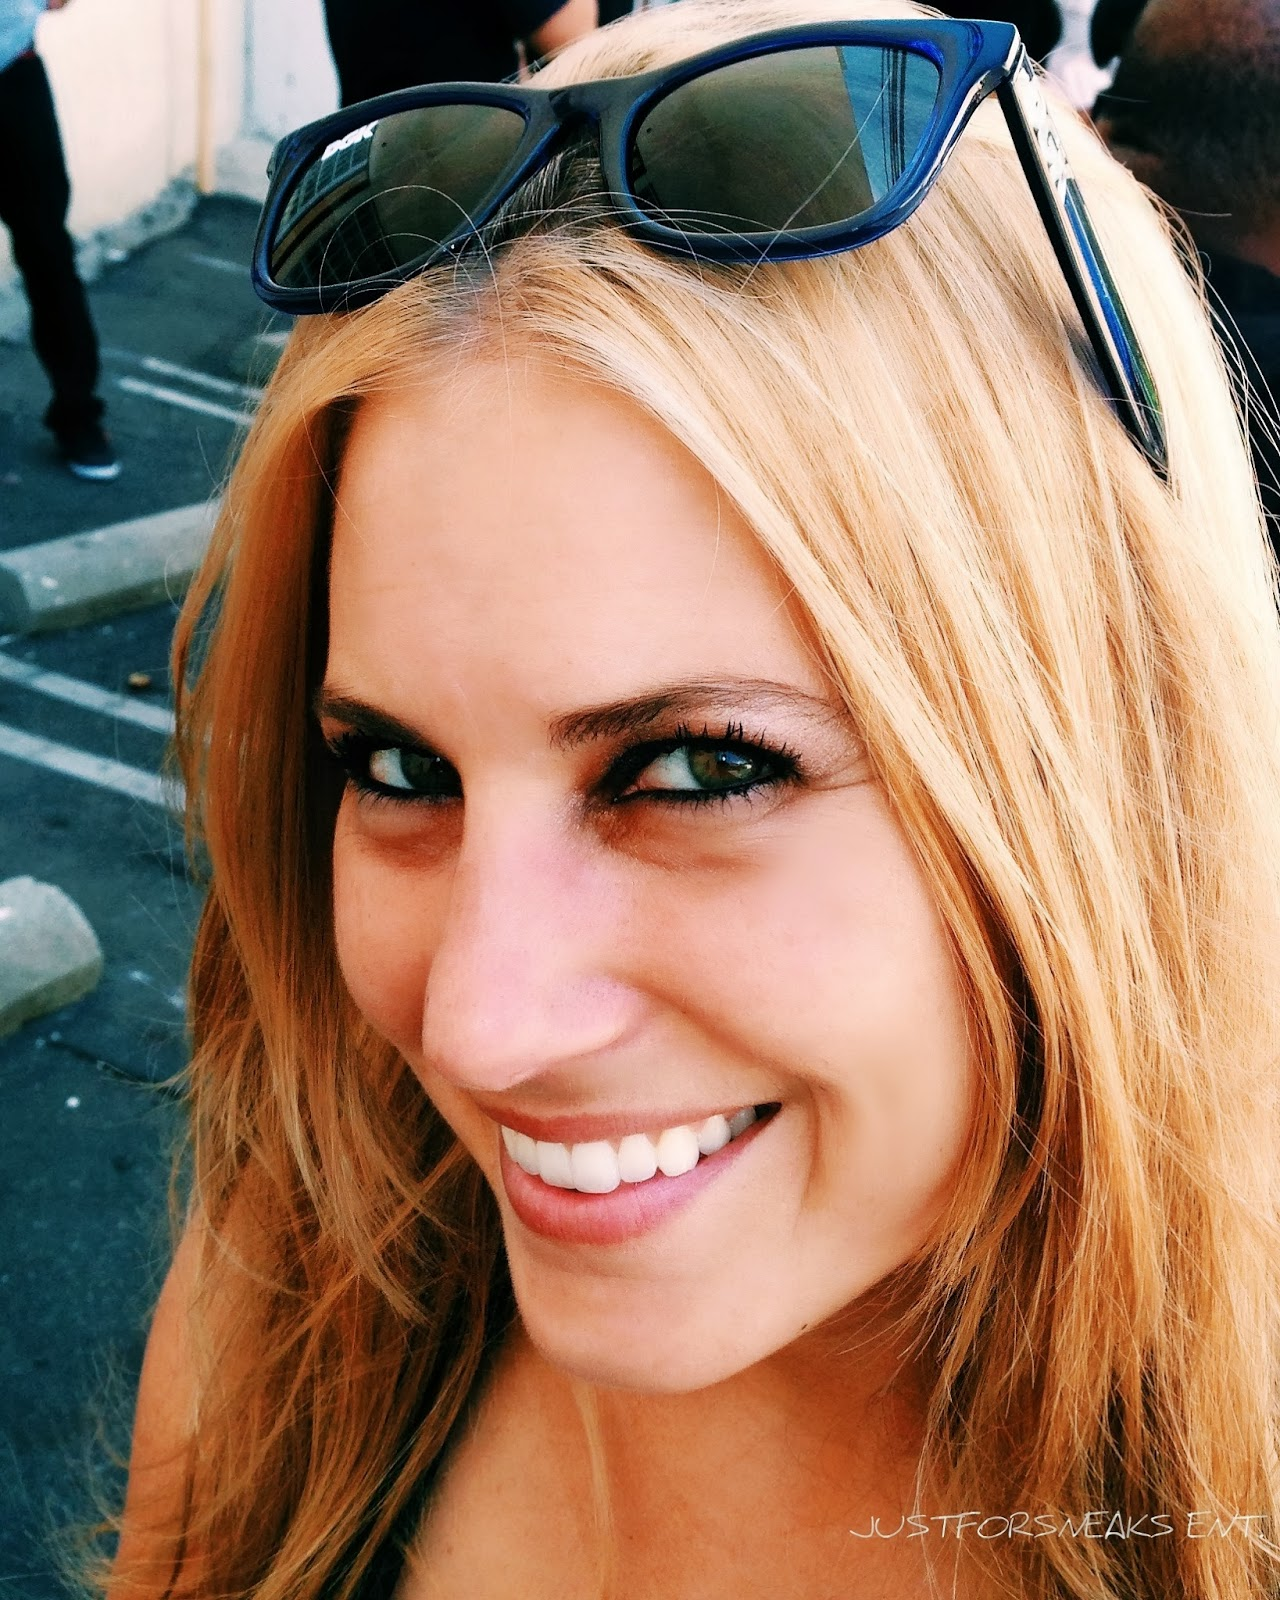 Nikki Sotelo